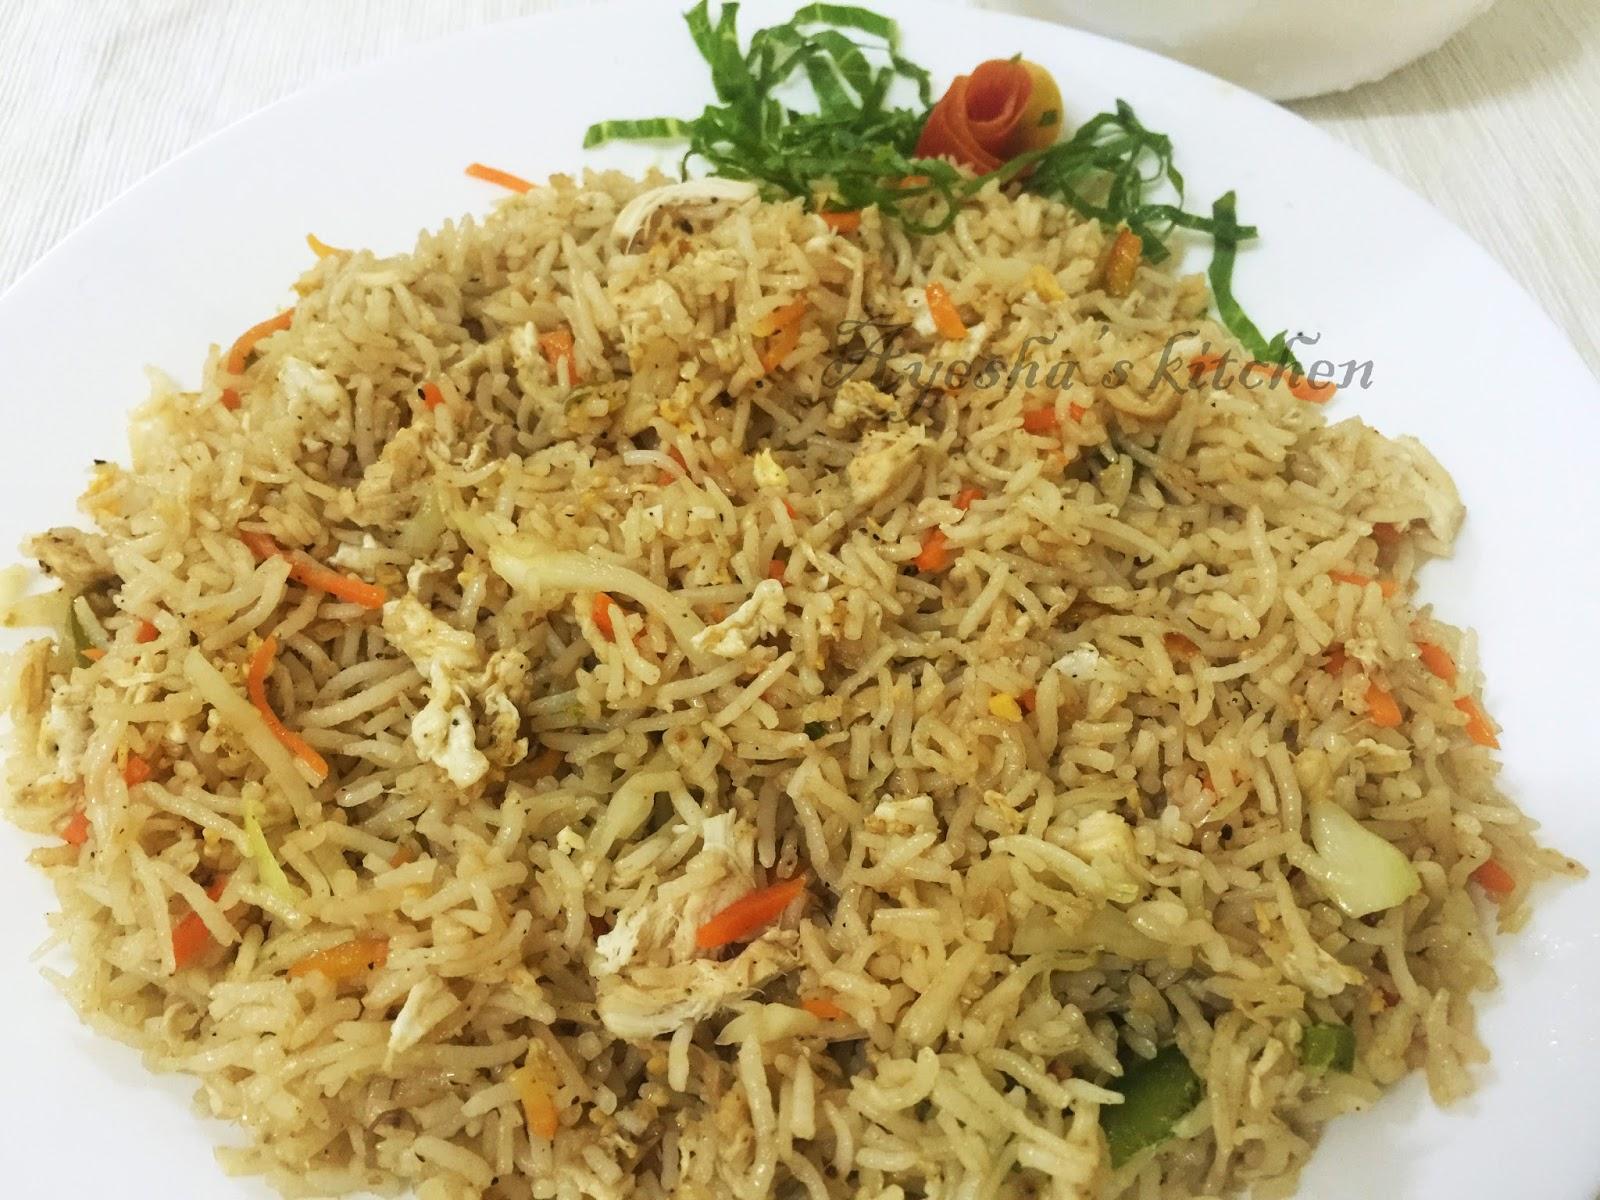 Pepper chicken fried rice recipe